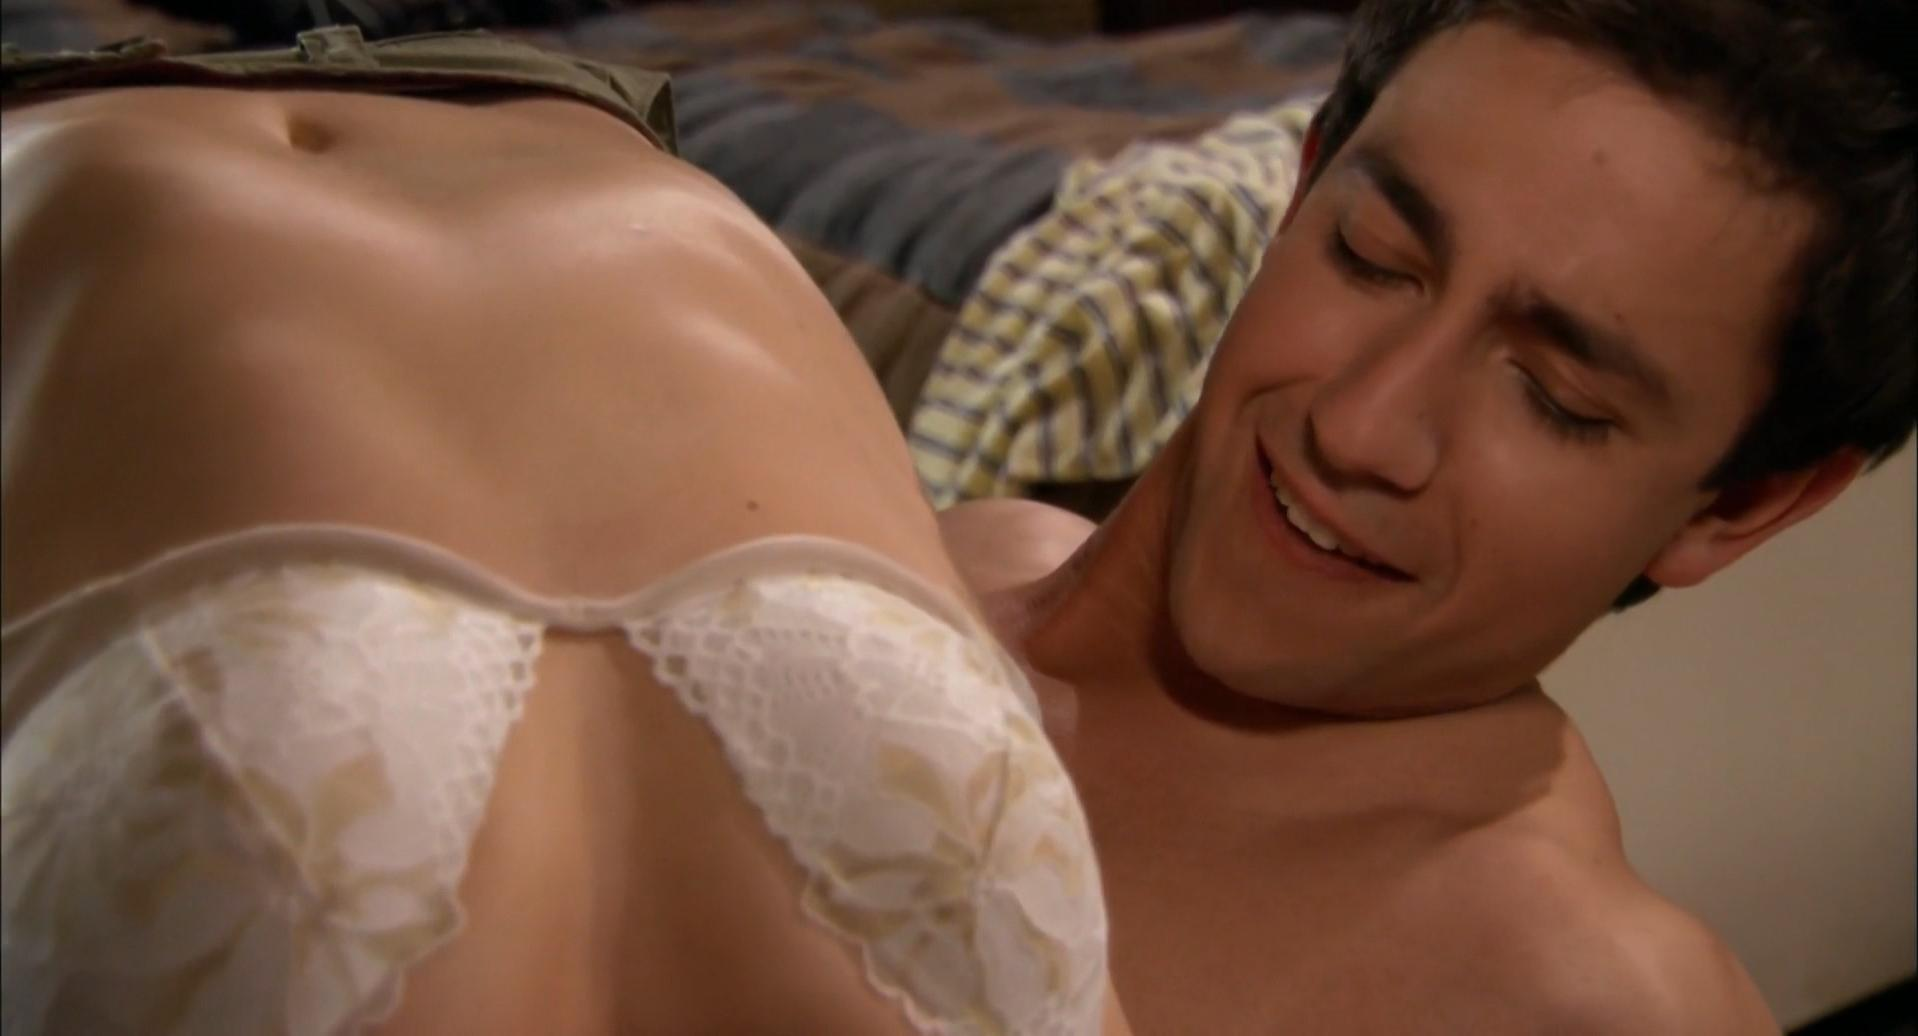 American Pie Actress Porn Video nude video celebs » sarah power nude - american pie presents